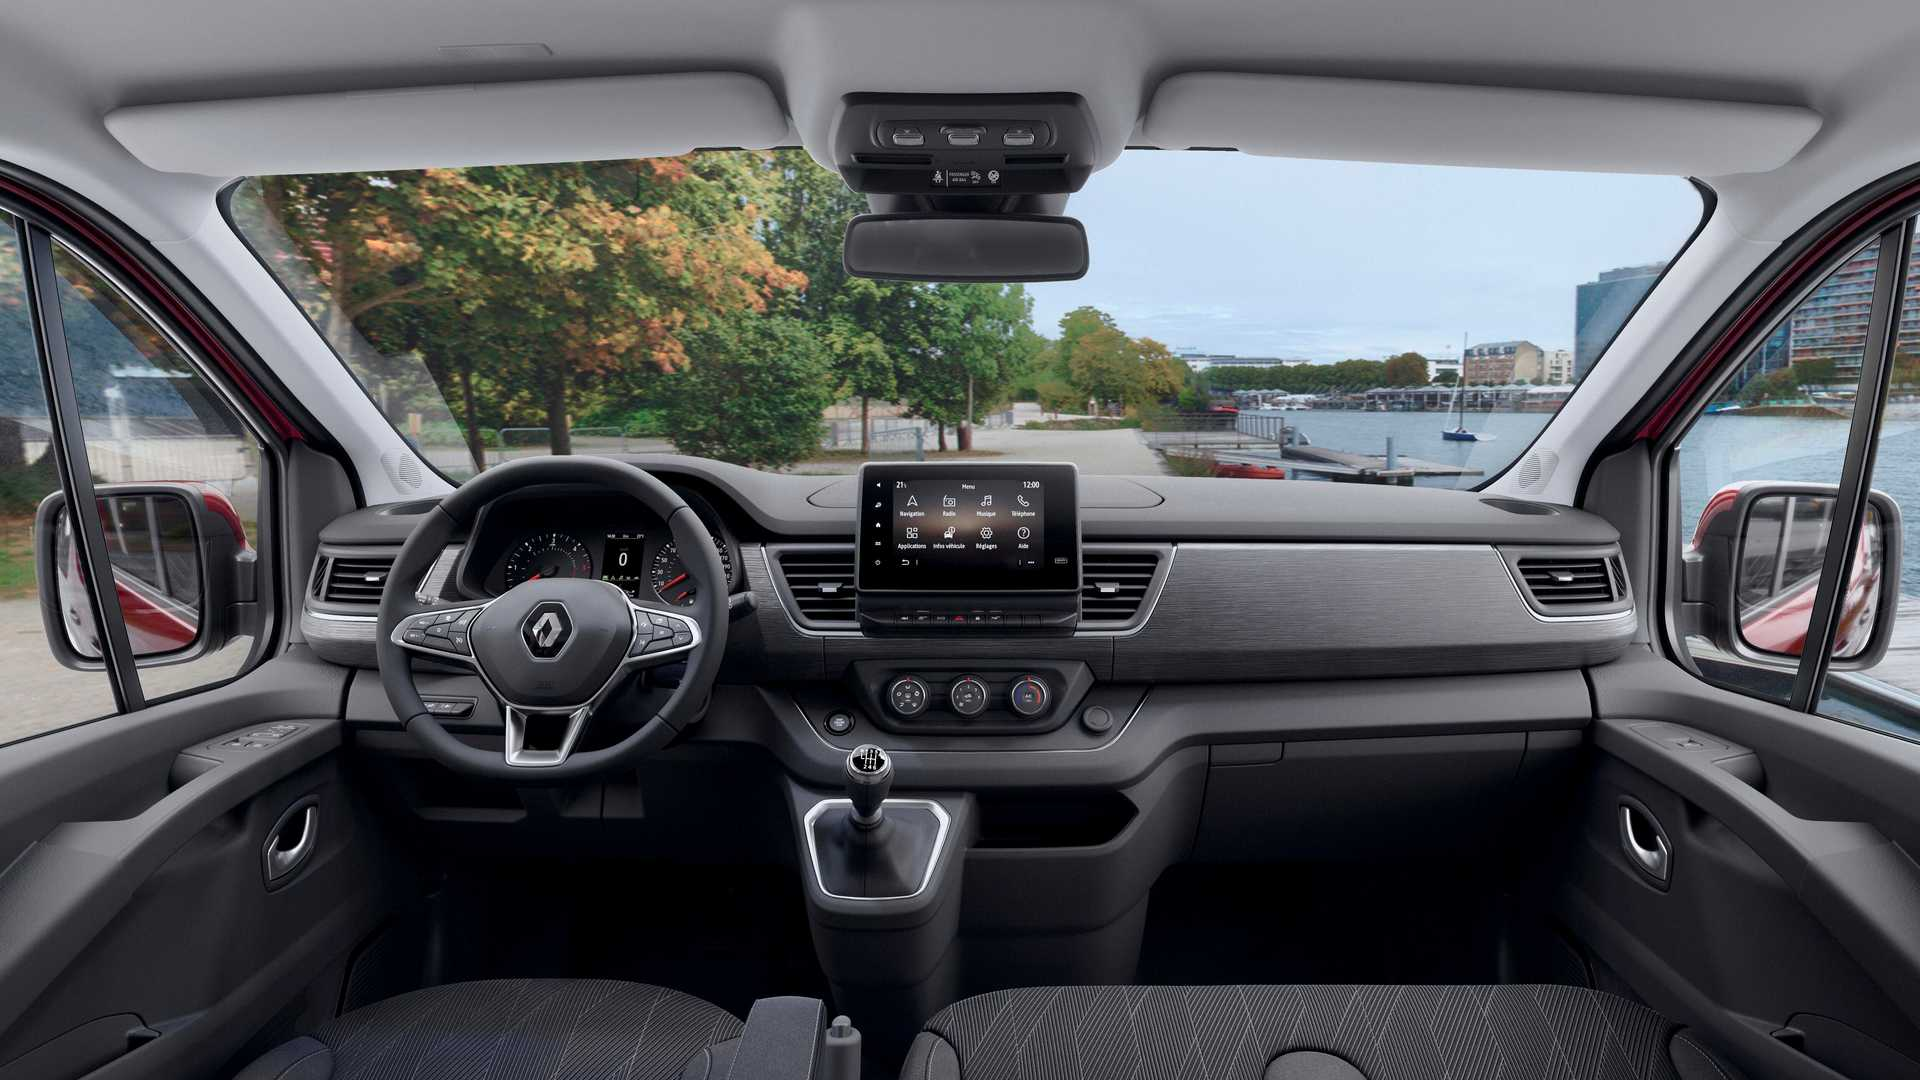 2020-renault-trafic-facelift-interior